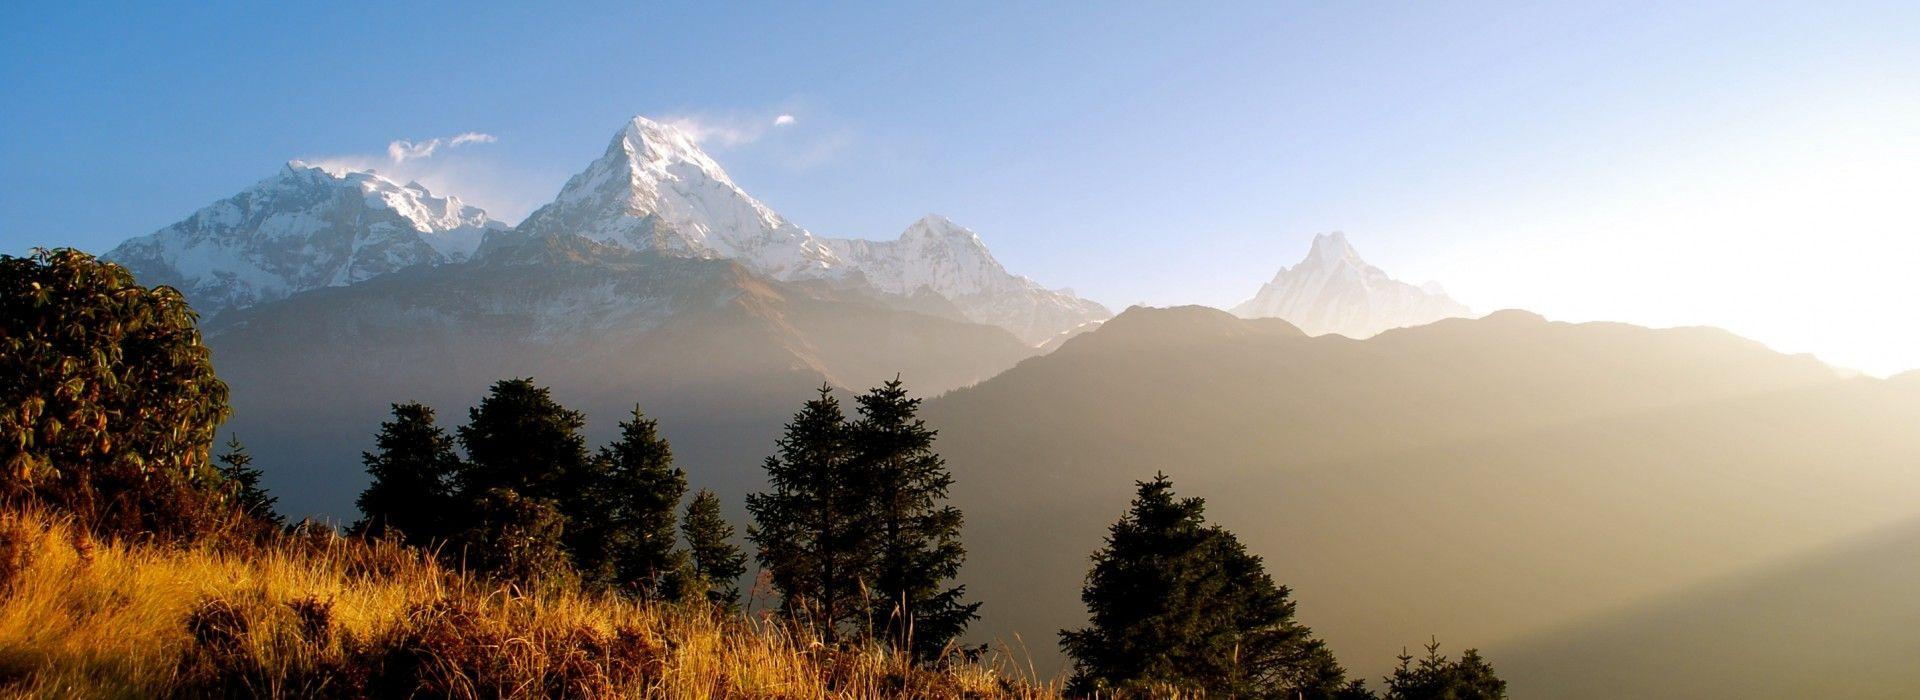 Trekking Tours in Gokyo and Everest Base Camp trek